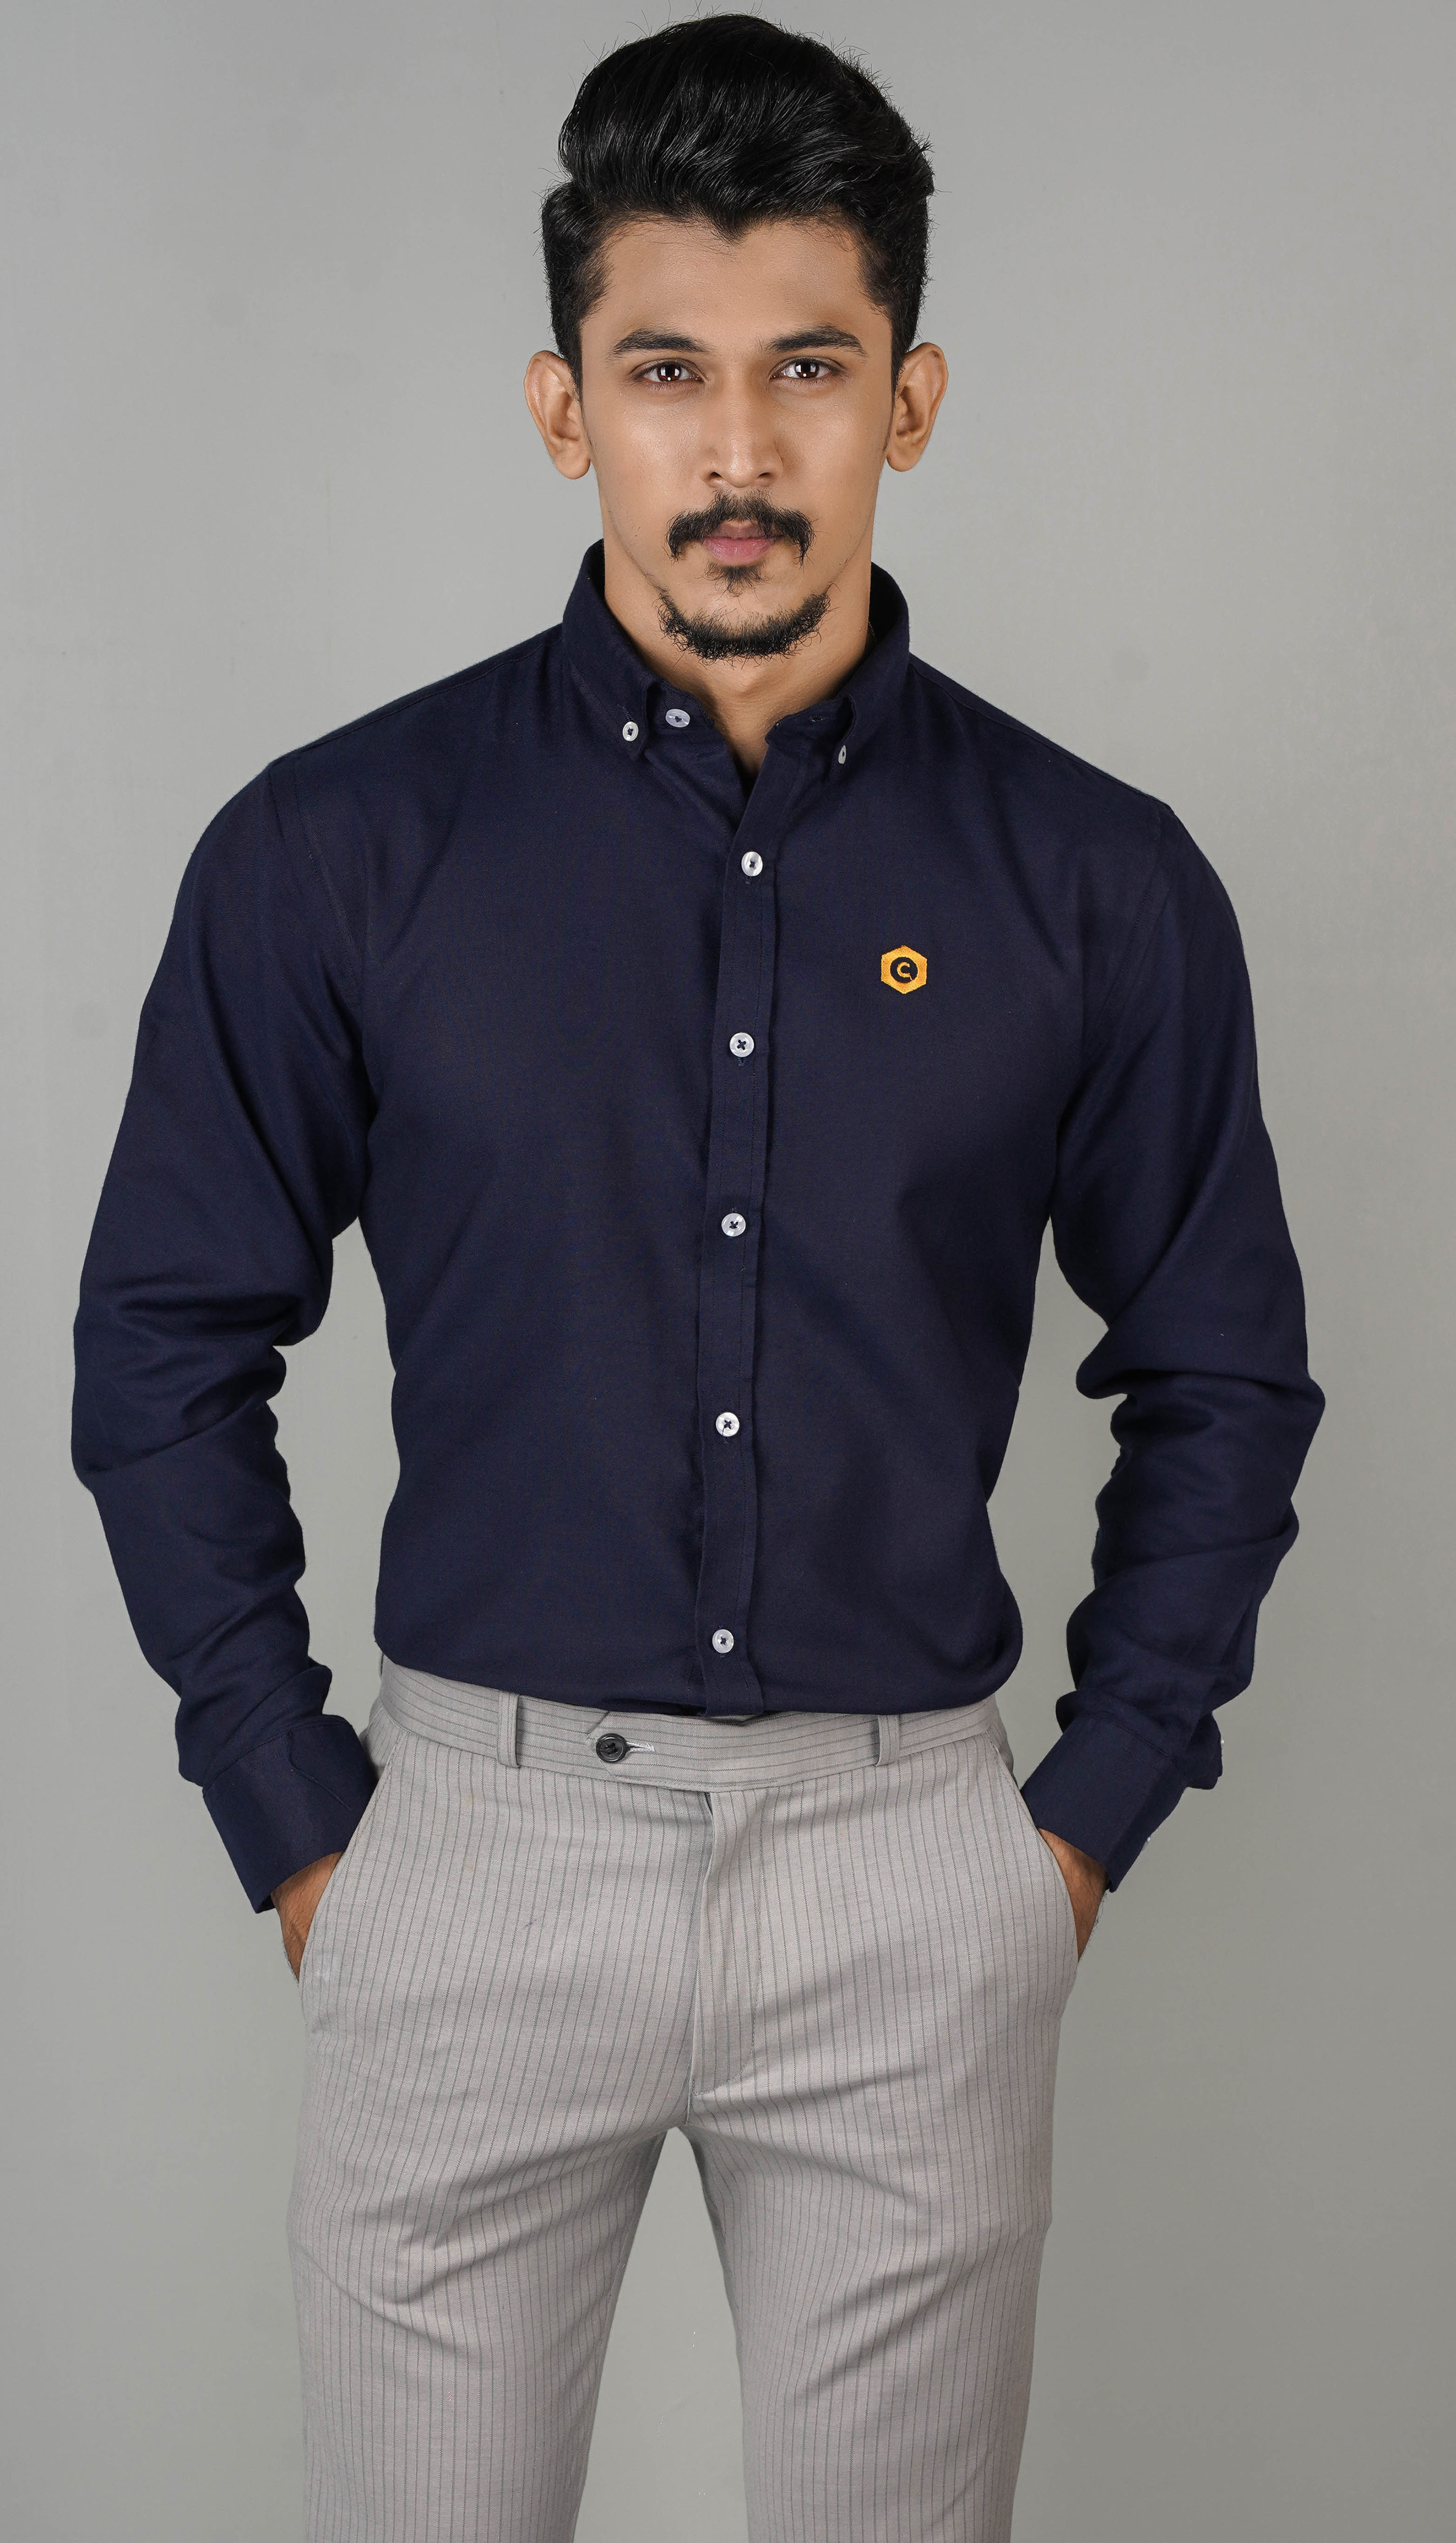 CODE Anchored Blue Printed Cotton Formal Shirt For Men SKU: CD-12